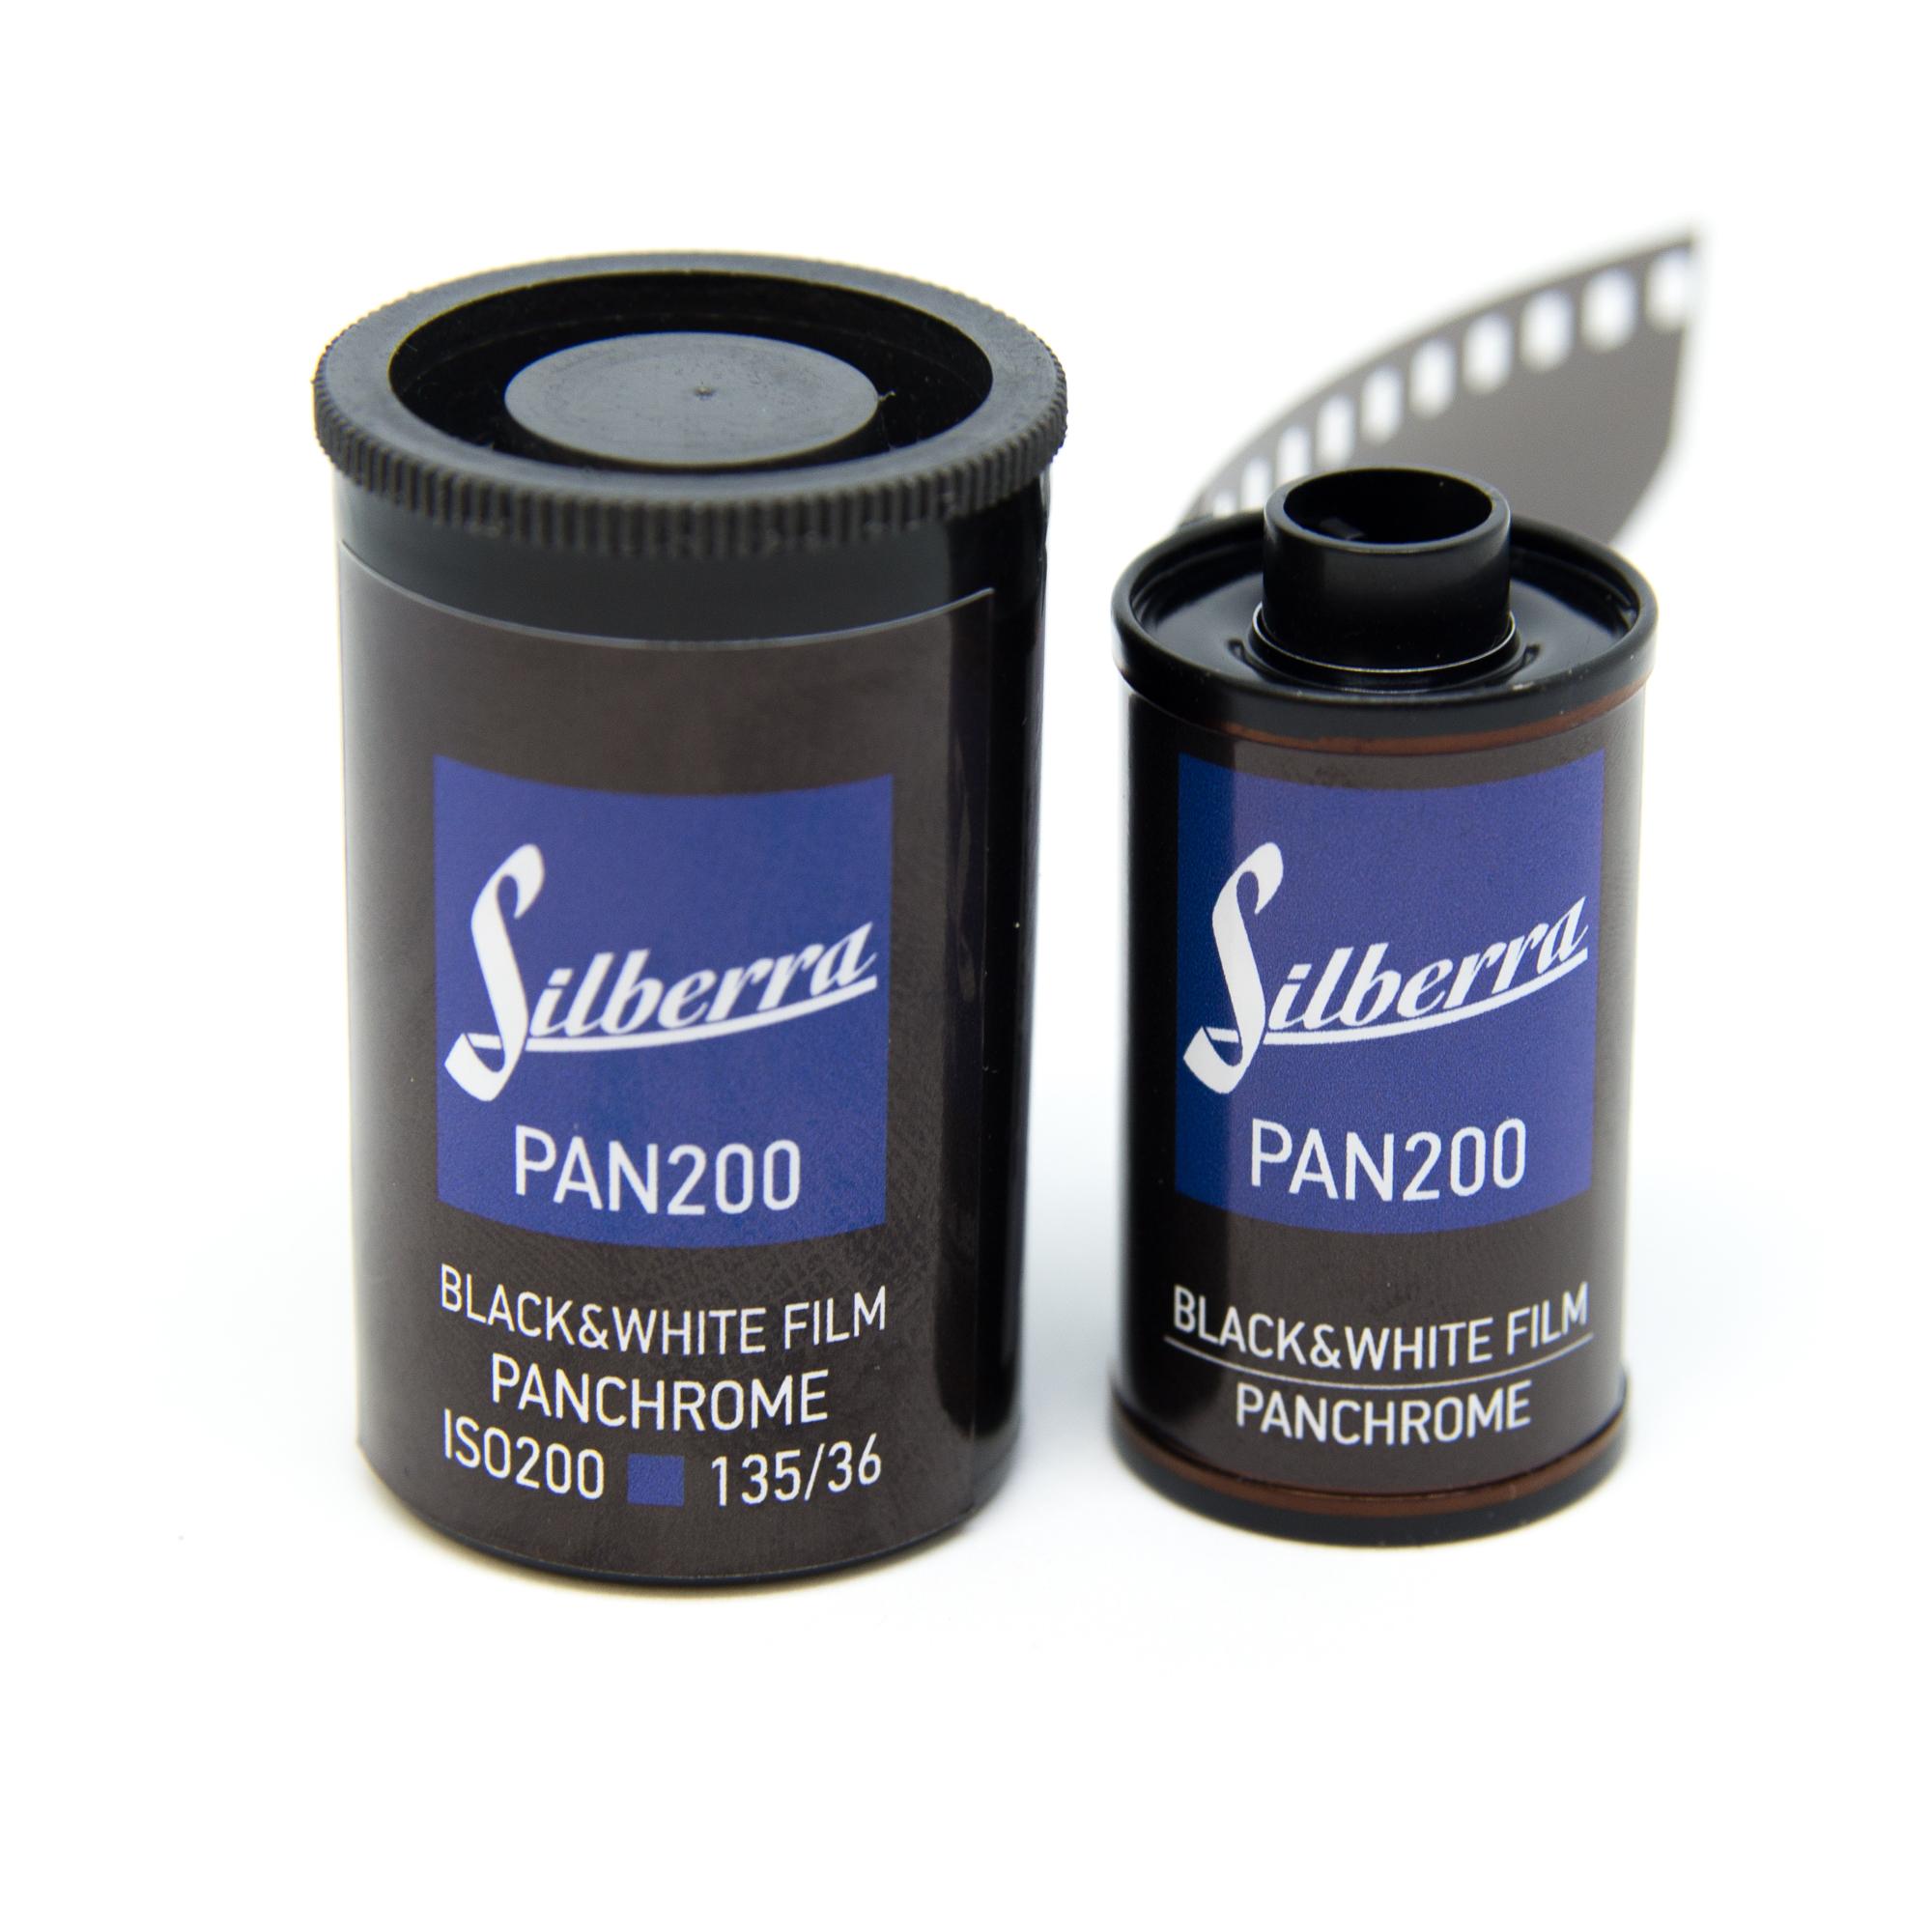 Фотопленка Silberra PAN 200/135-36